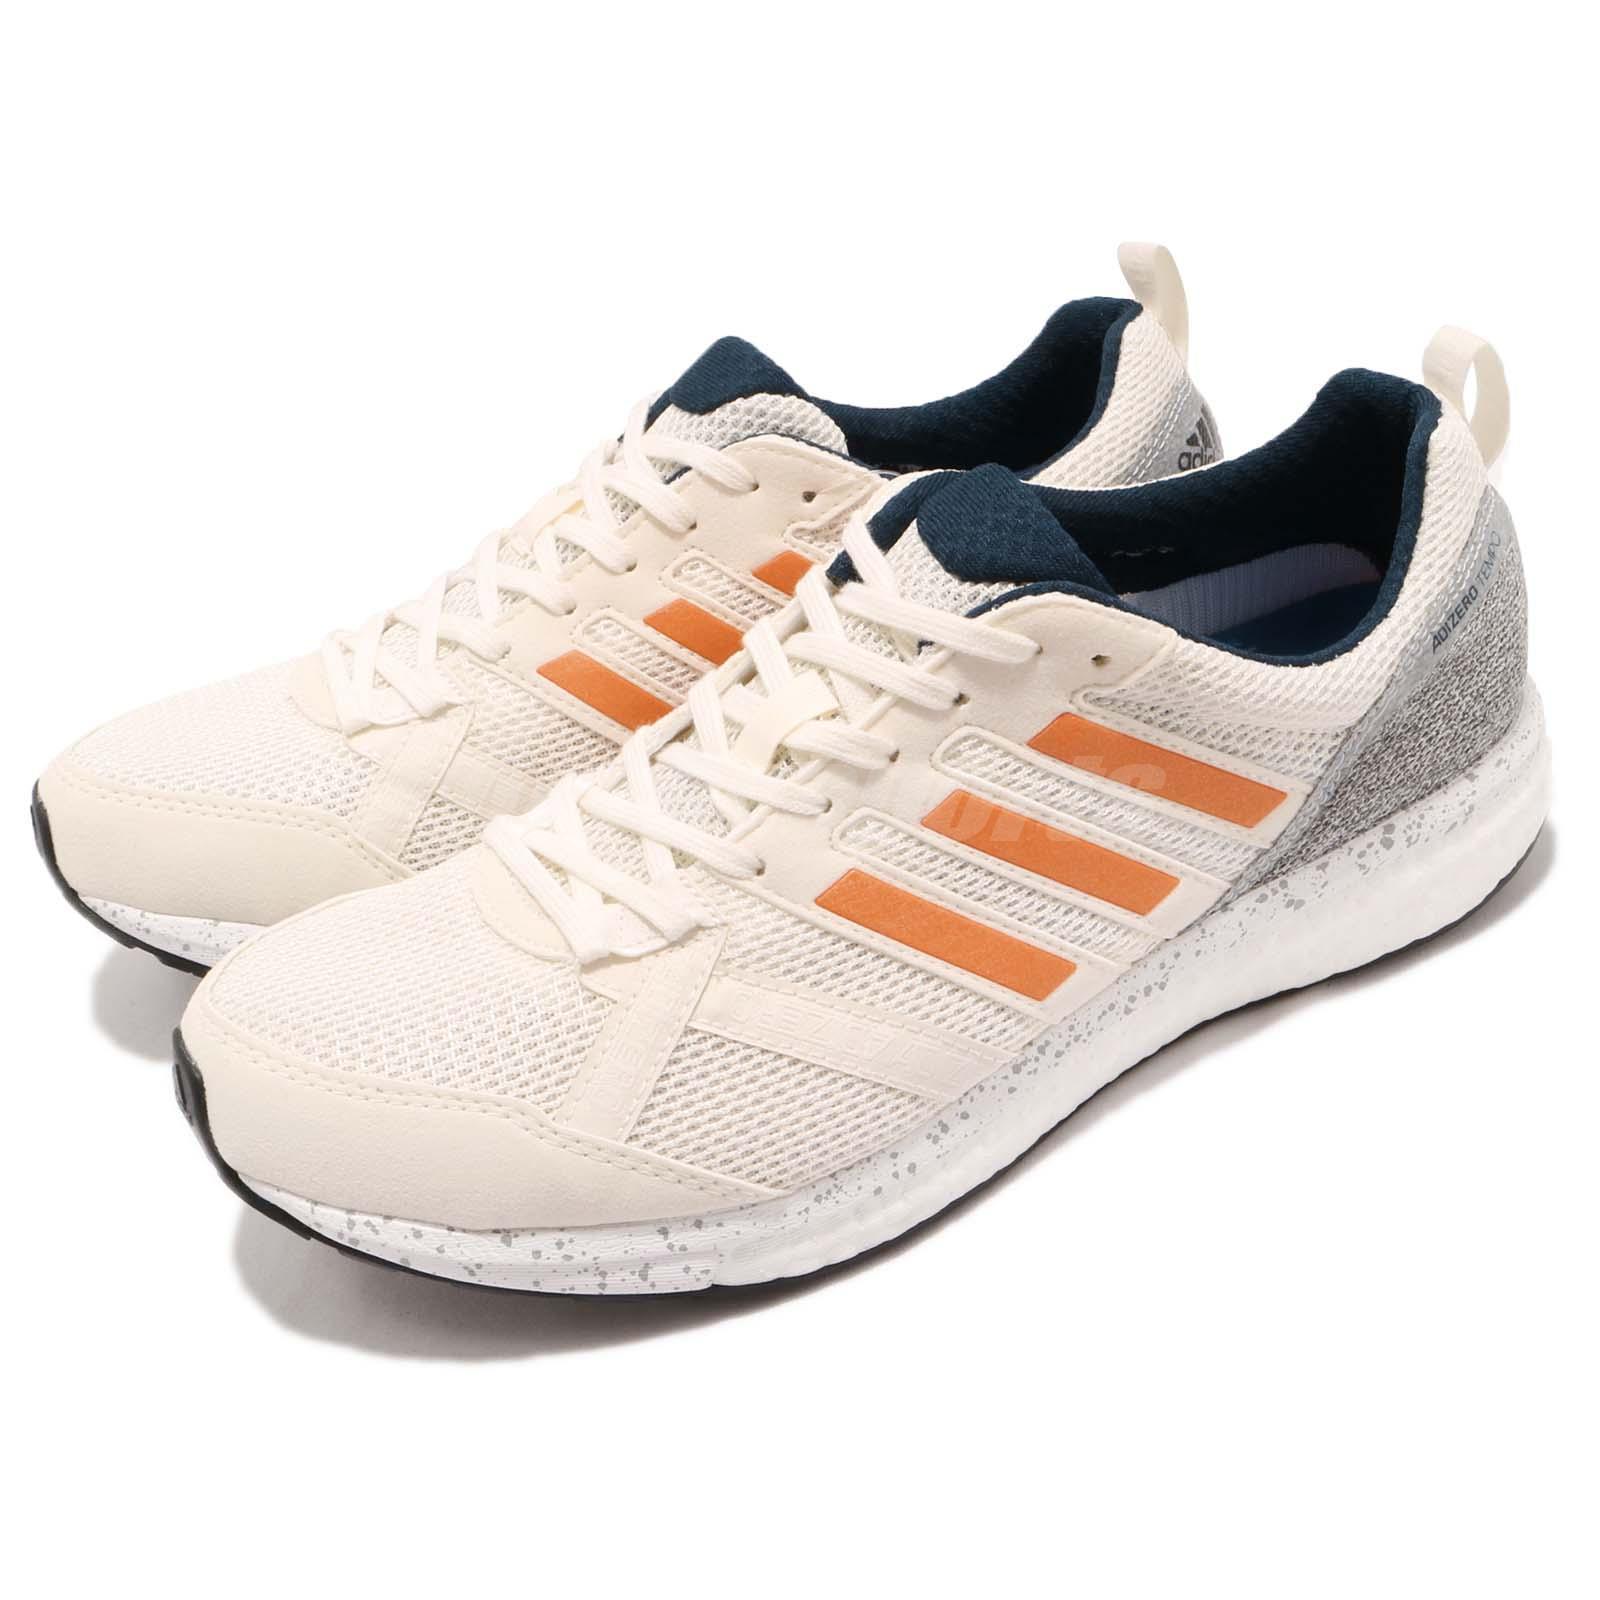 Details about adidas Adizero Tempo 9 M Boost Off White Hi Res Orange Men  Running Shoes BB6433 5cc4b7a1169